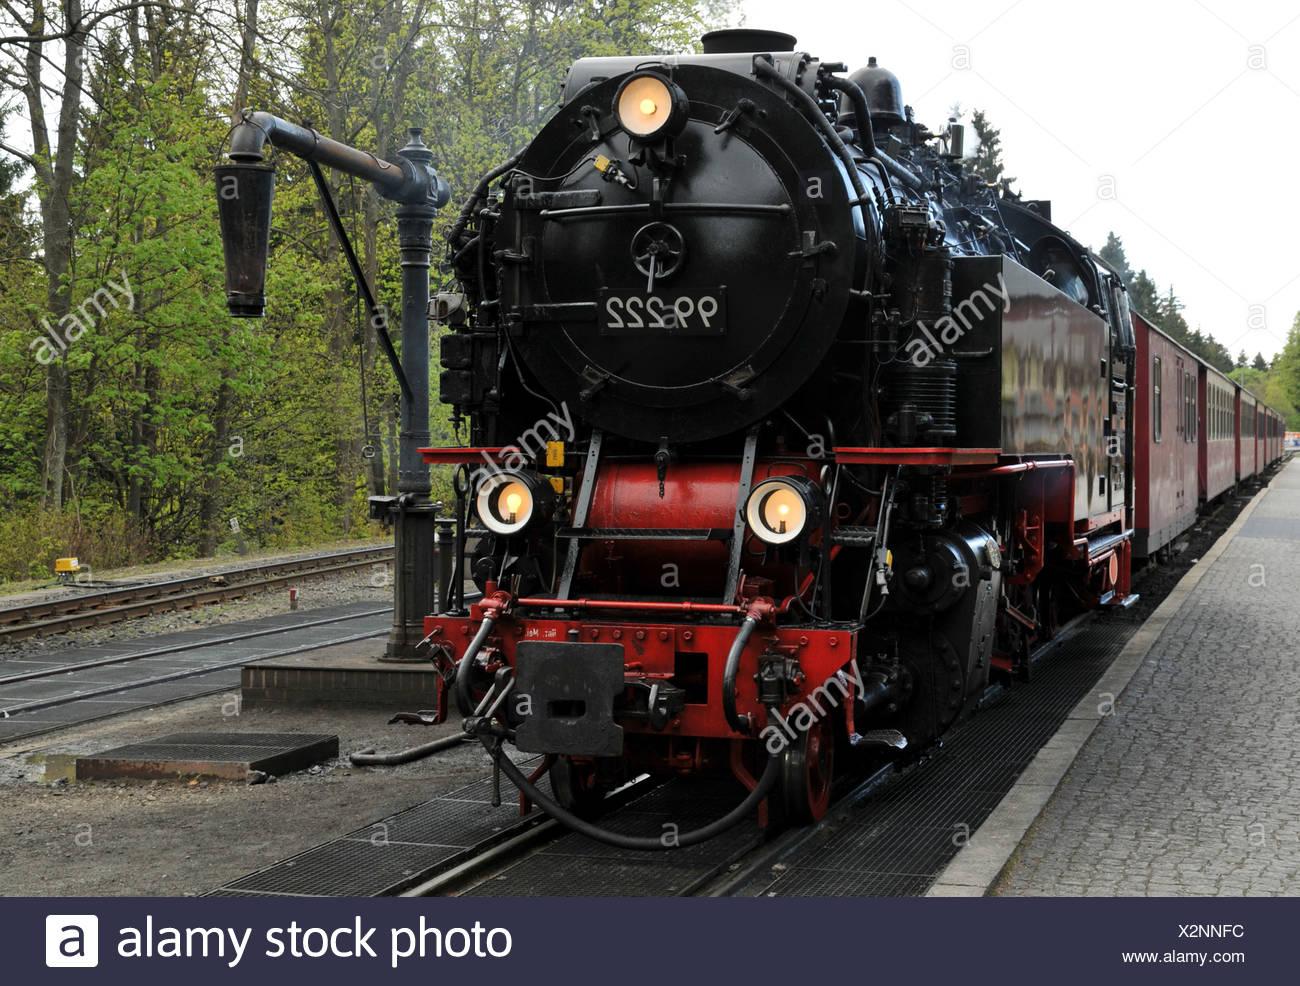 Steam train departs - Stock Image